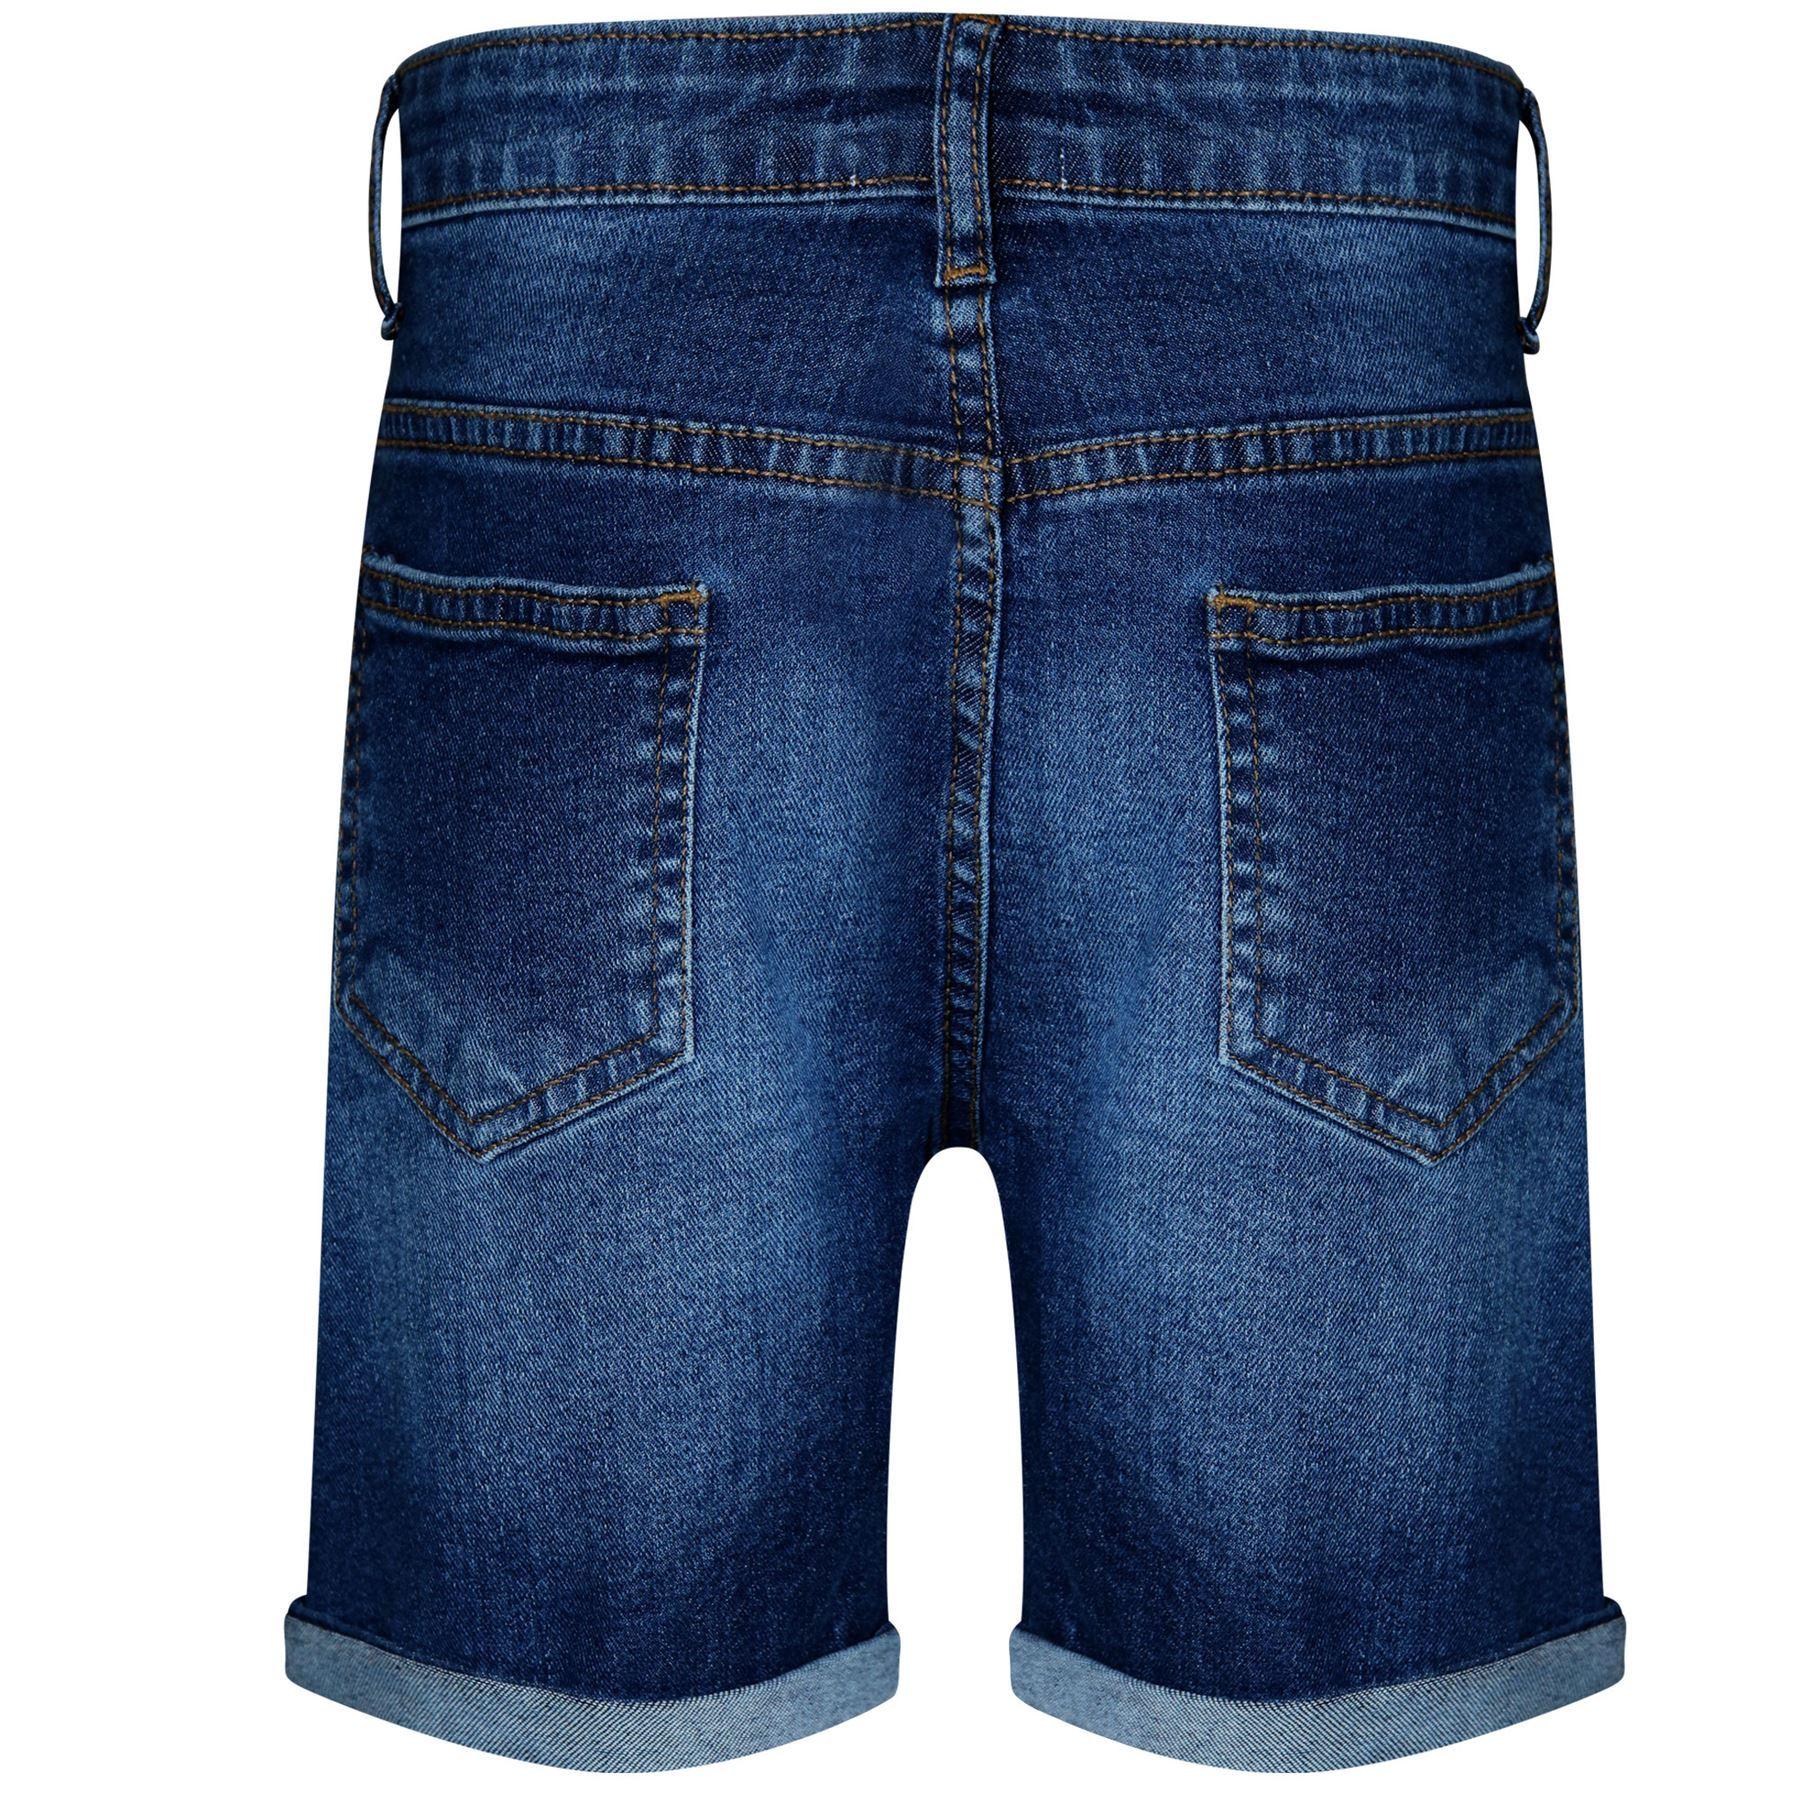 Kids Boys Shorts Denim Ripped Dark Blue Chino Bermuda Jean Knee Length Pant 5-13